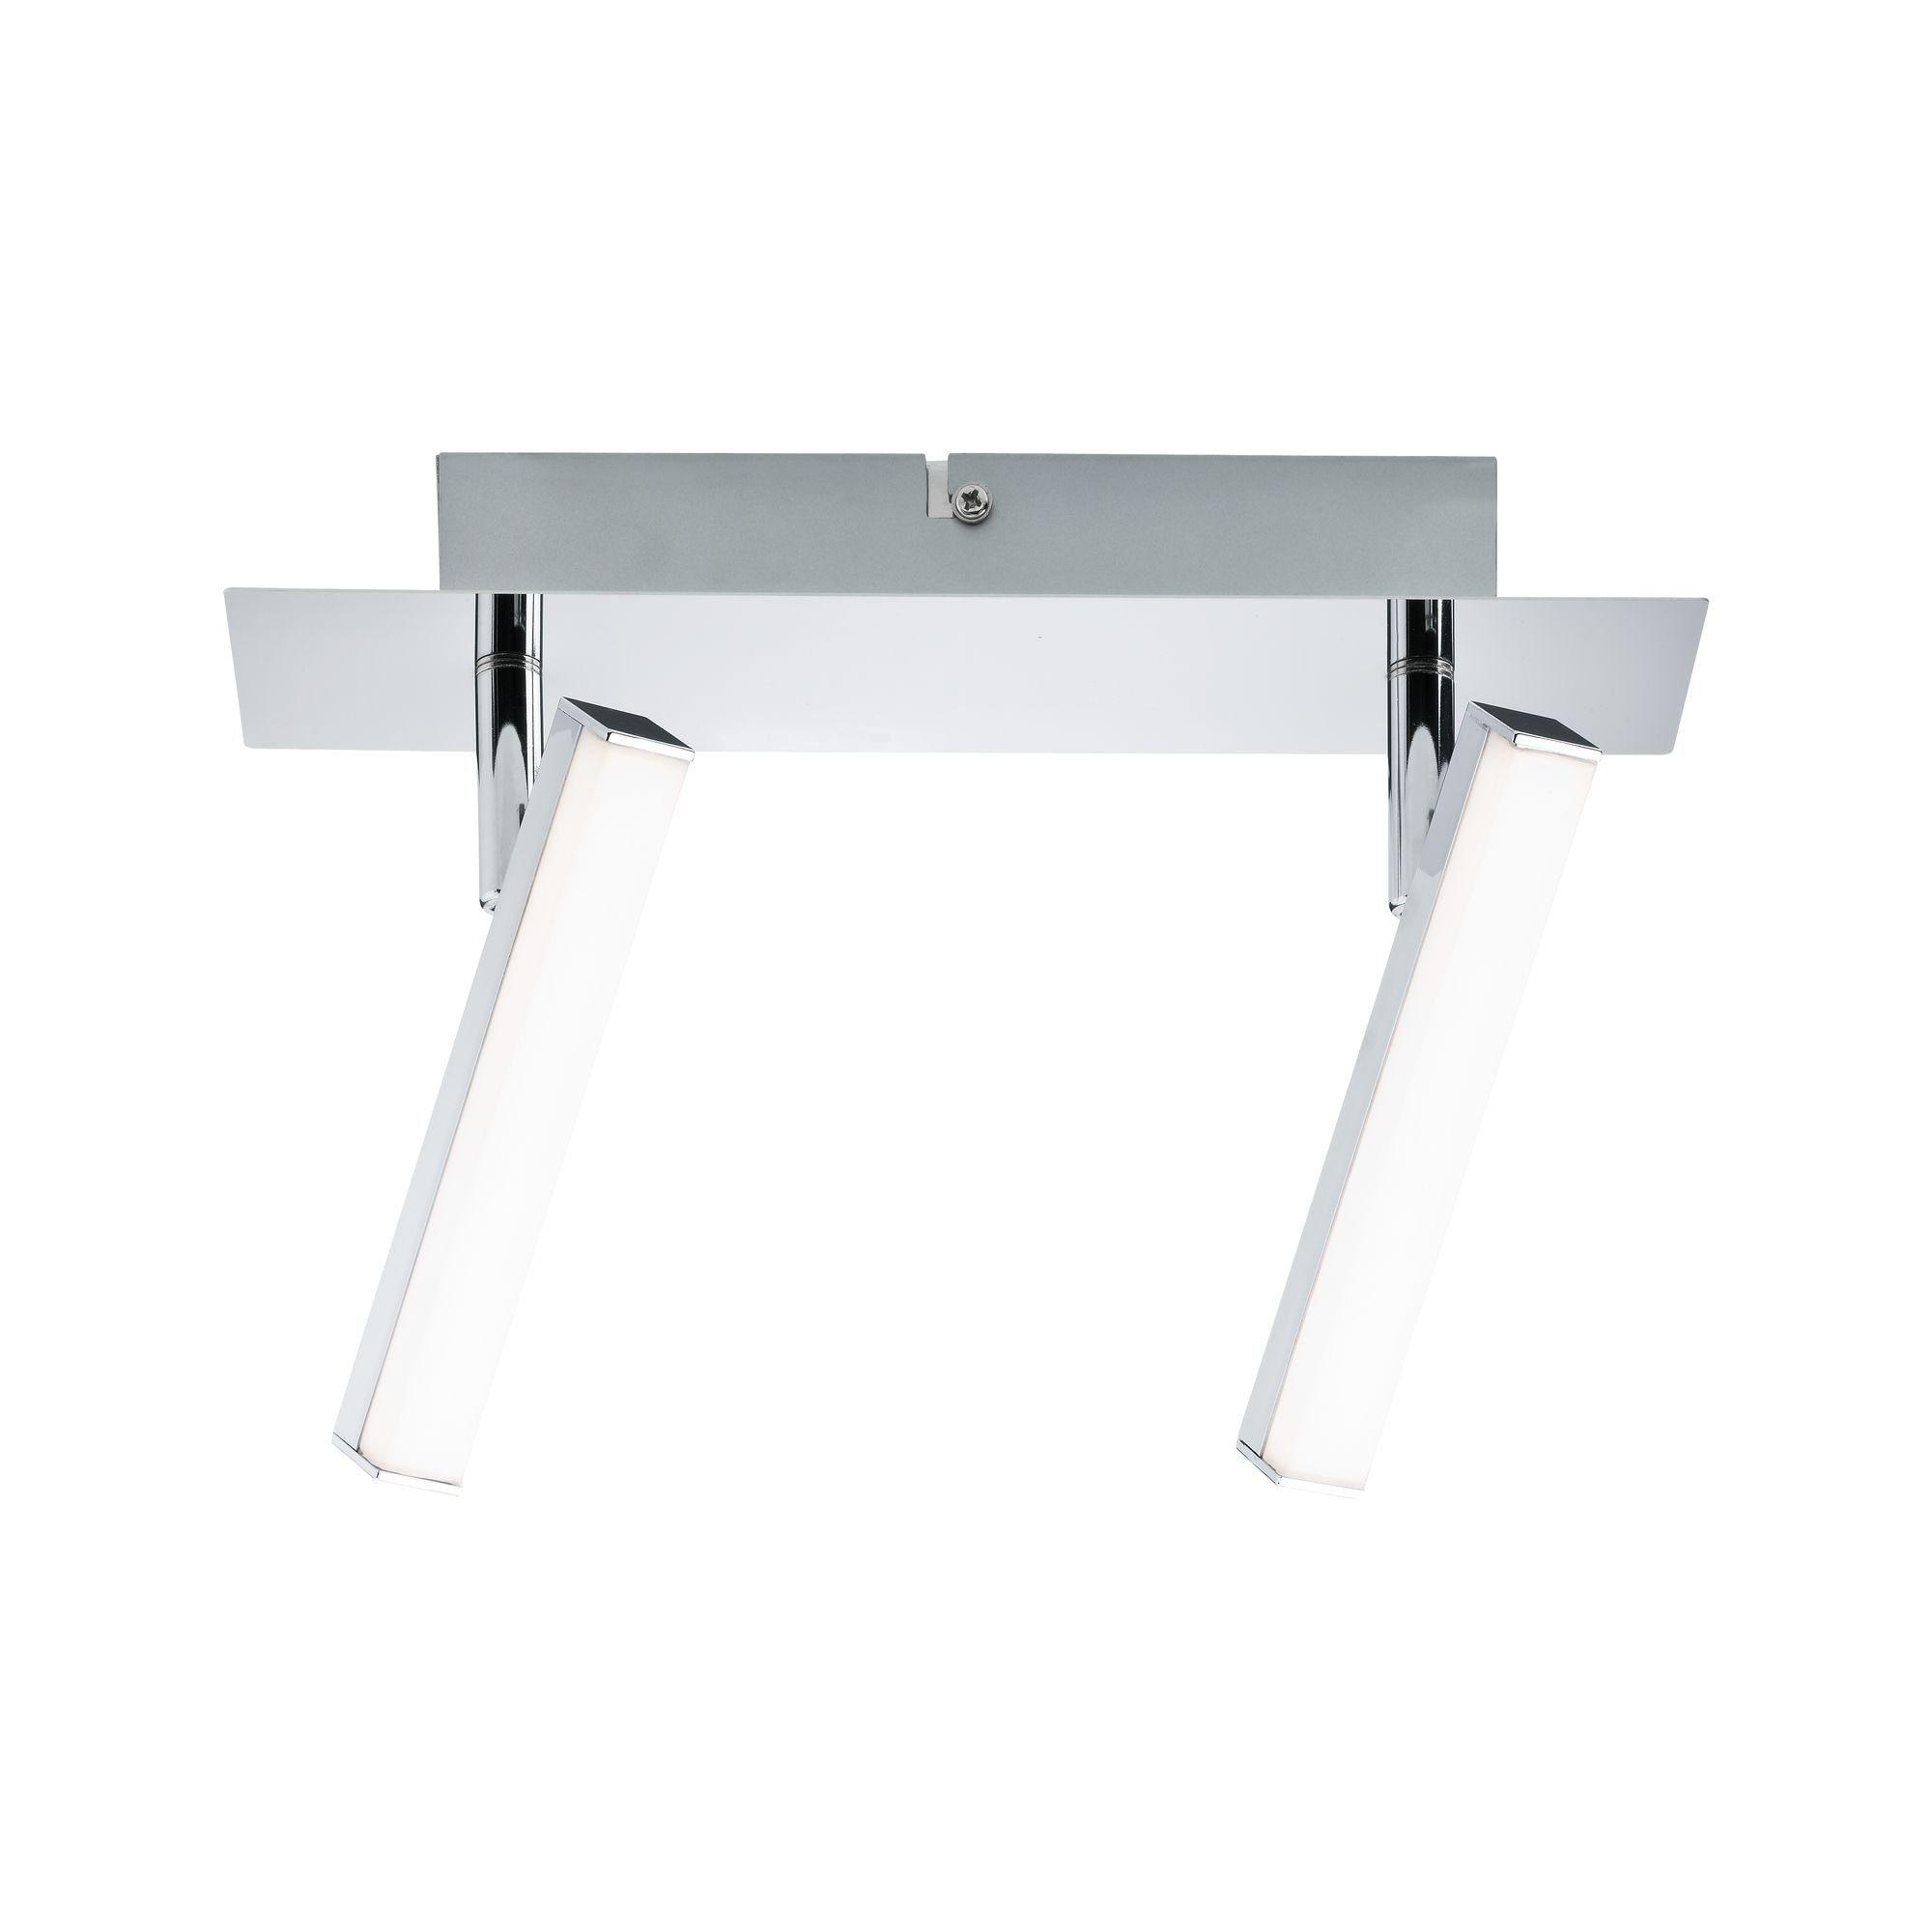 Paulmann LED Deckenleuchte 2er-Spot Chrom Silberfarben Pole 2x4,2W, 1 St., Warmweiß